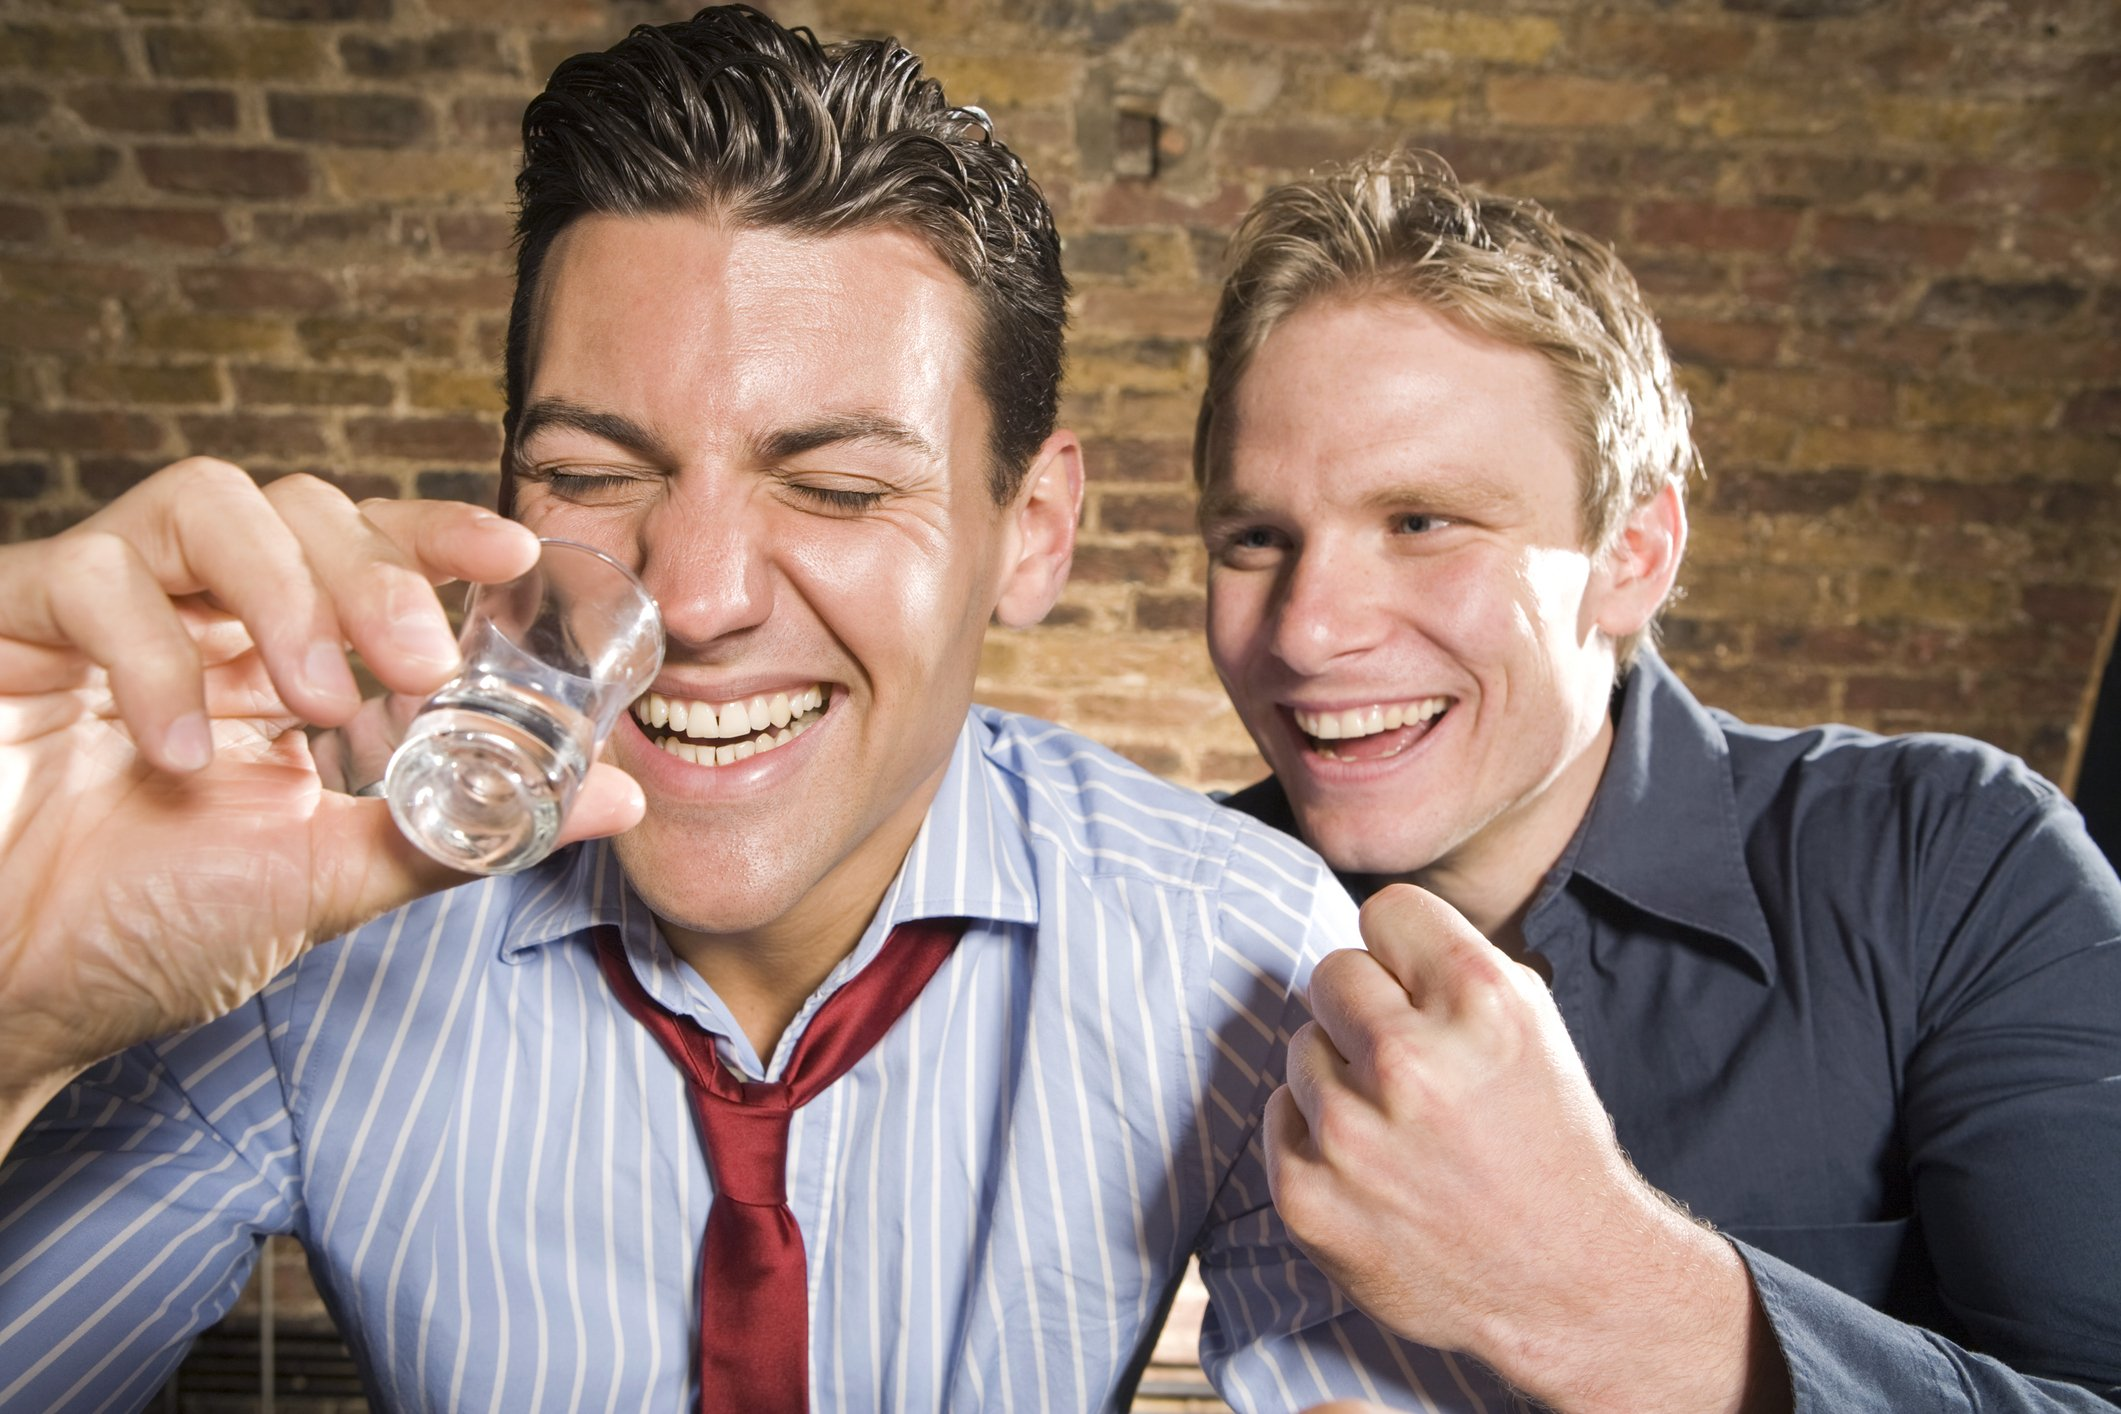 Drunk guys at a bar